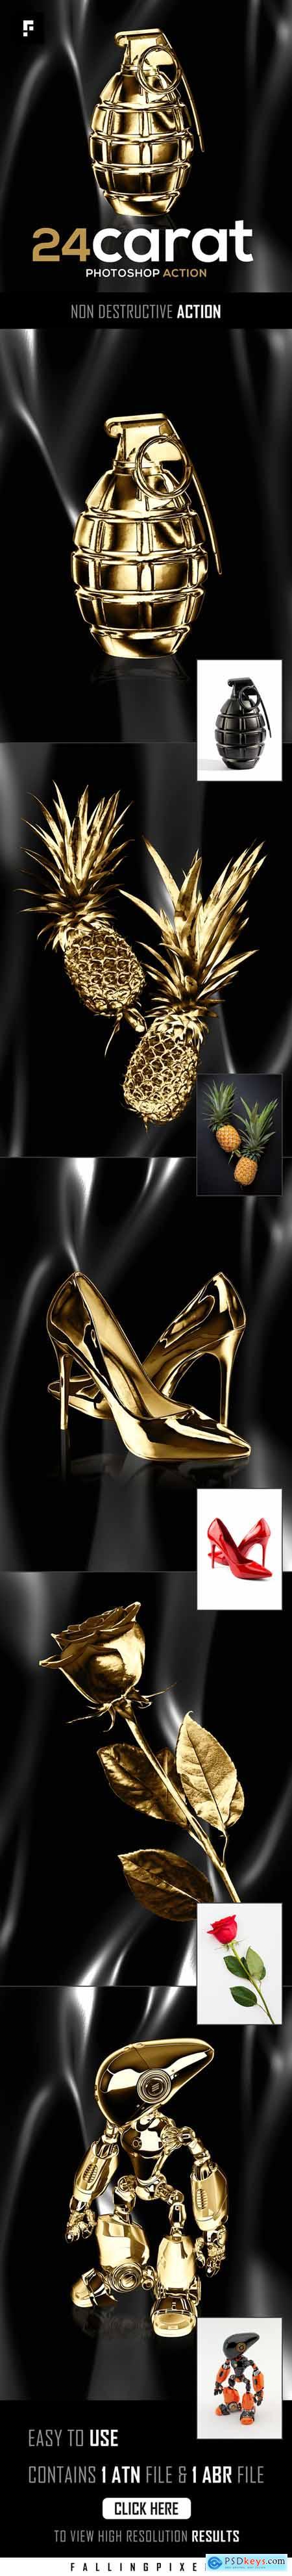 24 Carat Photoshop Action 26536703